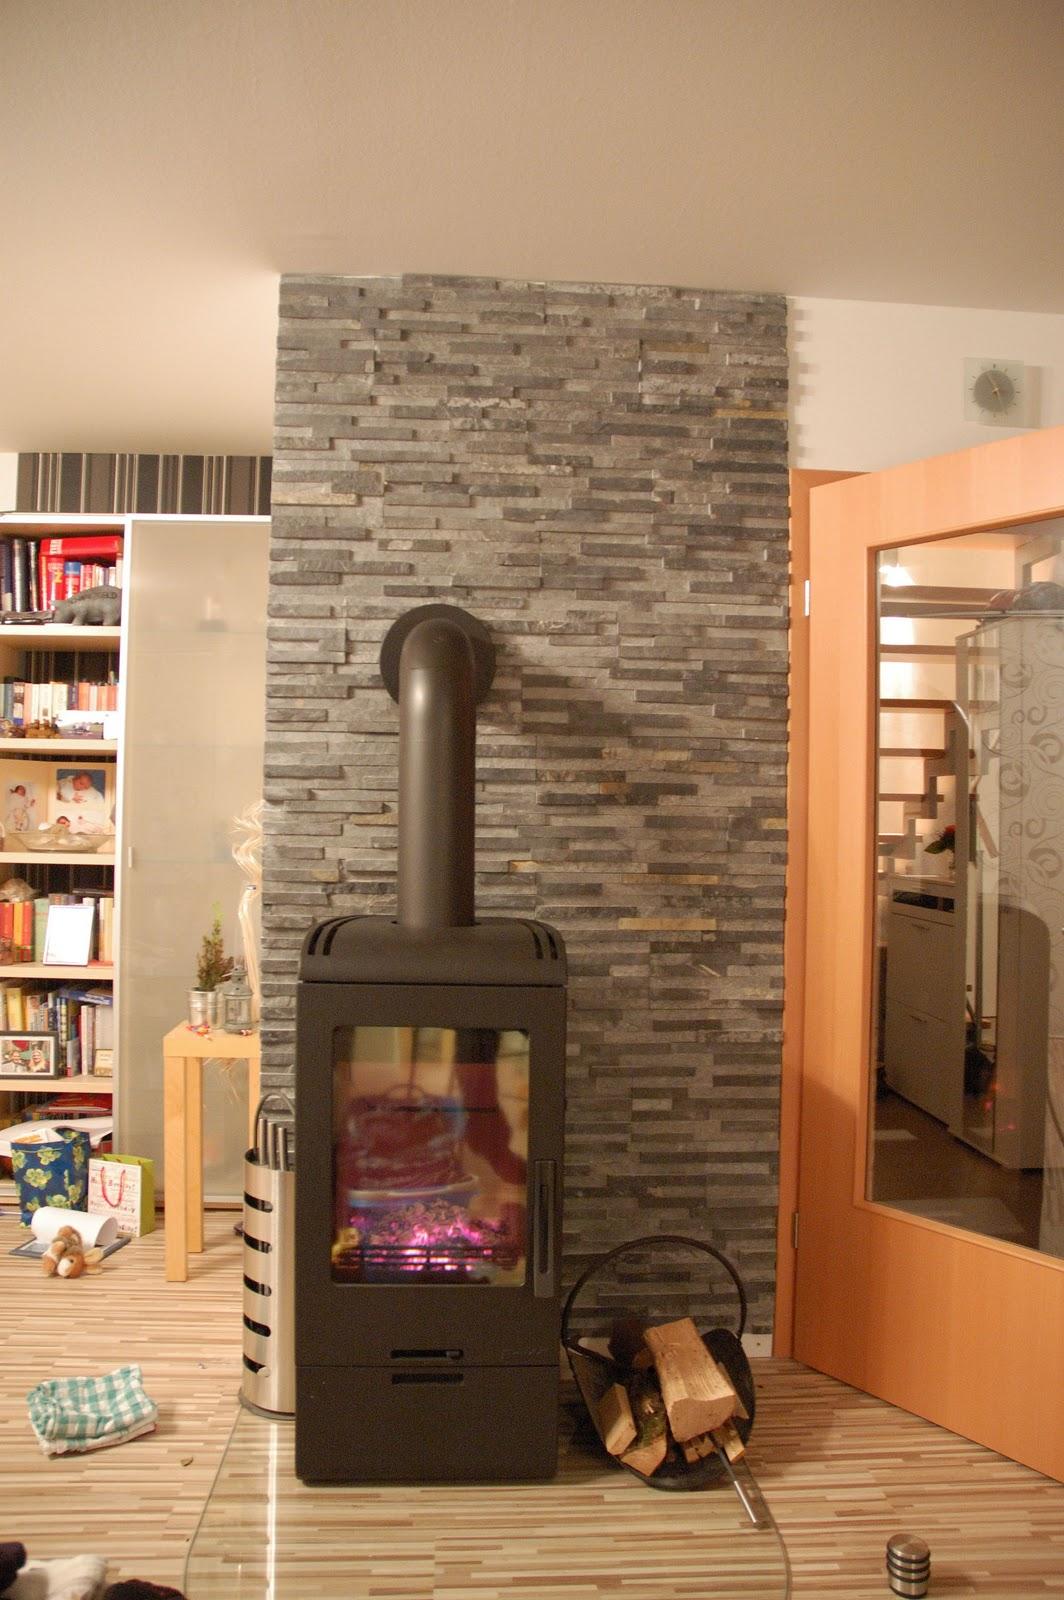 hausbau thiemorgen januar 2012. Black Bedroom Furniture Sets. Home Design Ideas